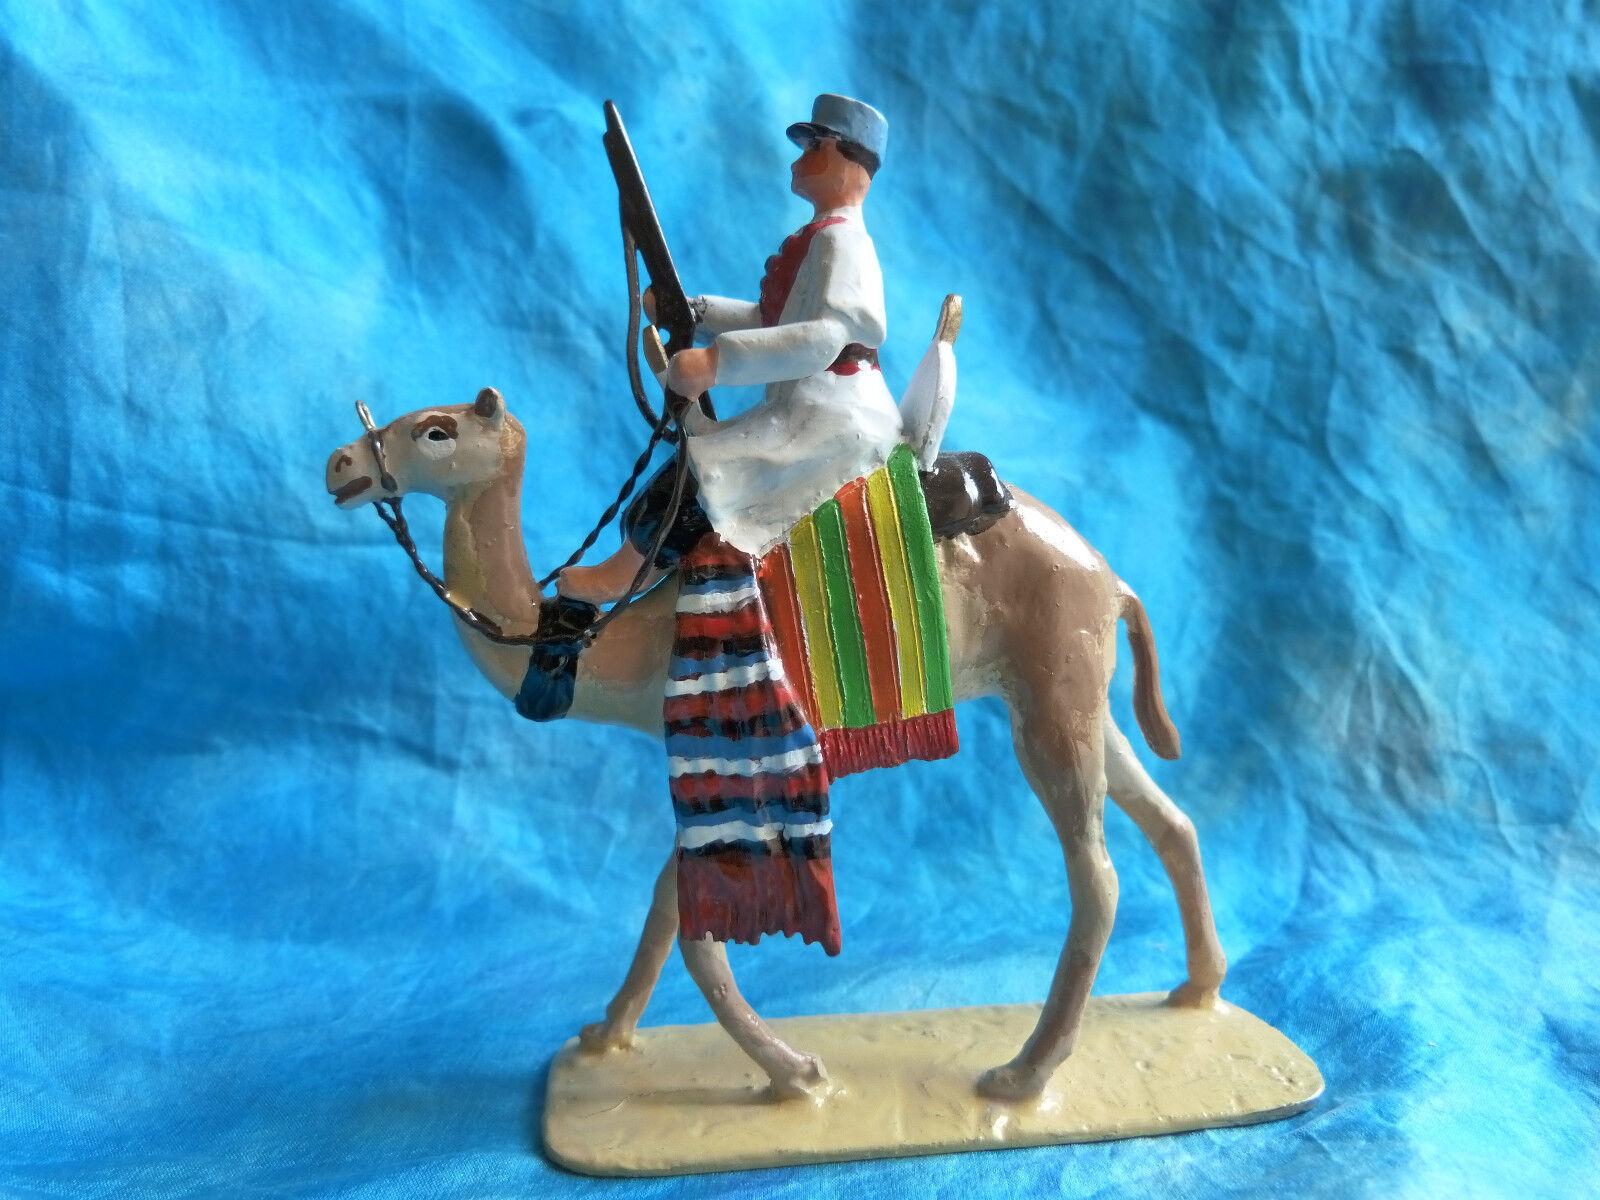 Soldat de plomb Guy Jouglet - Méhariste n  5  camel corps  - armées coloniales